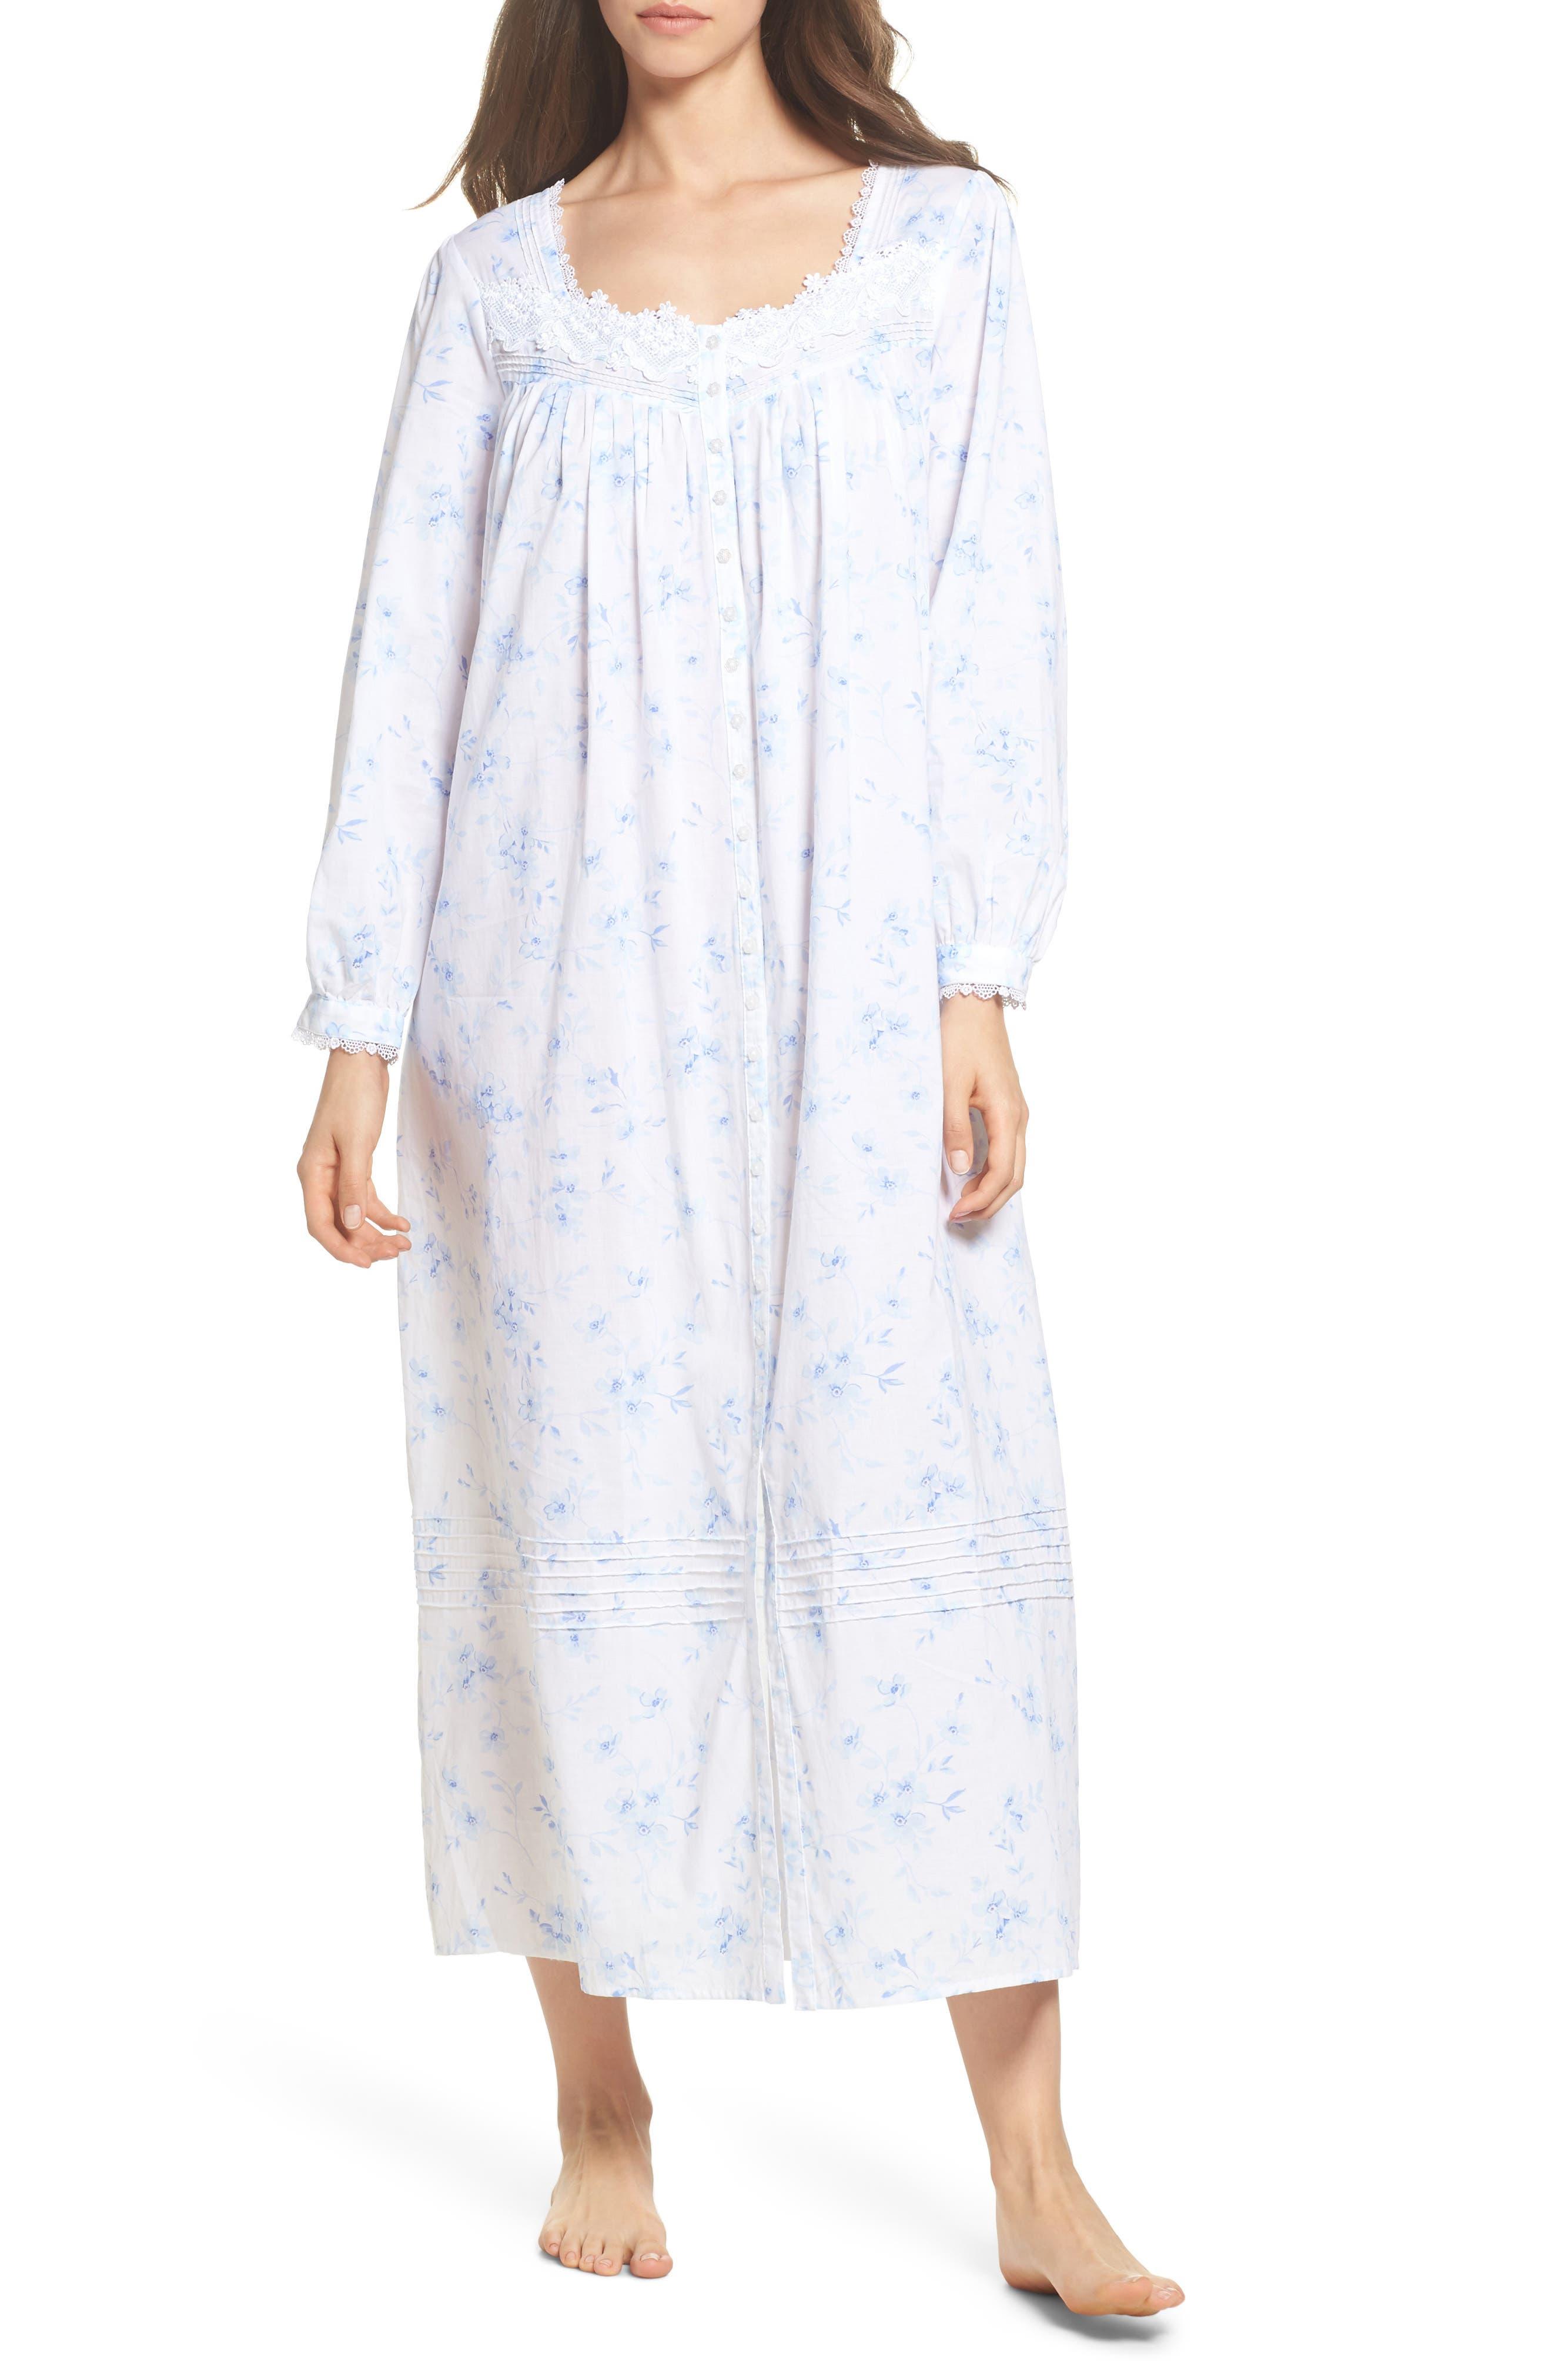 Cotton Lawn Ballet Nightgown,                             Main thumbnail 1, color,                             White Mono Floral